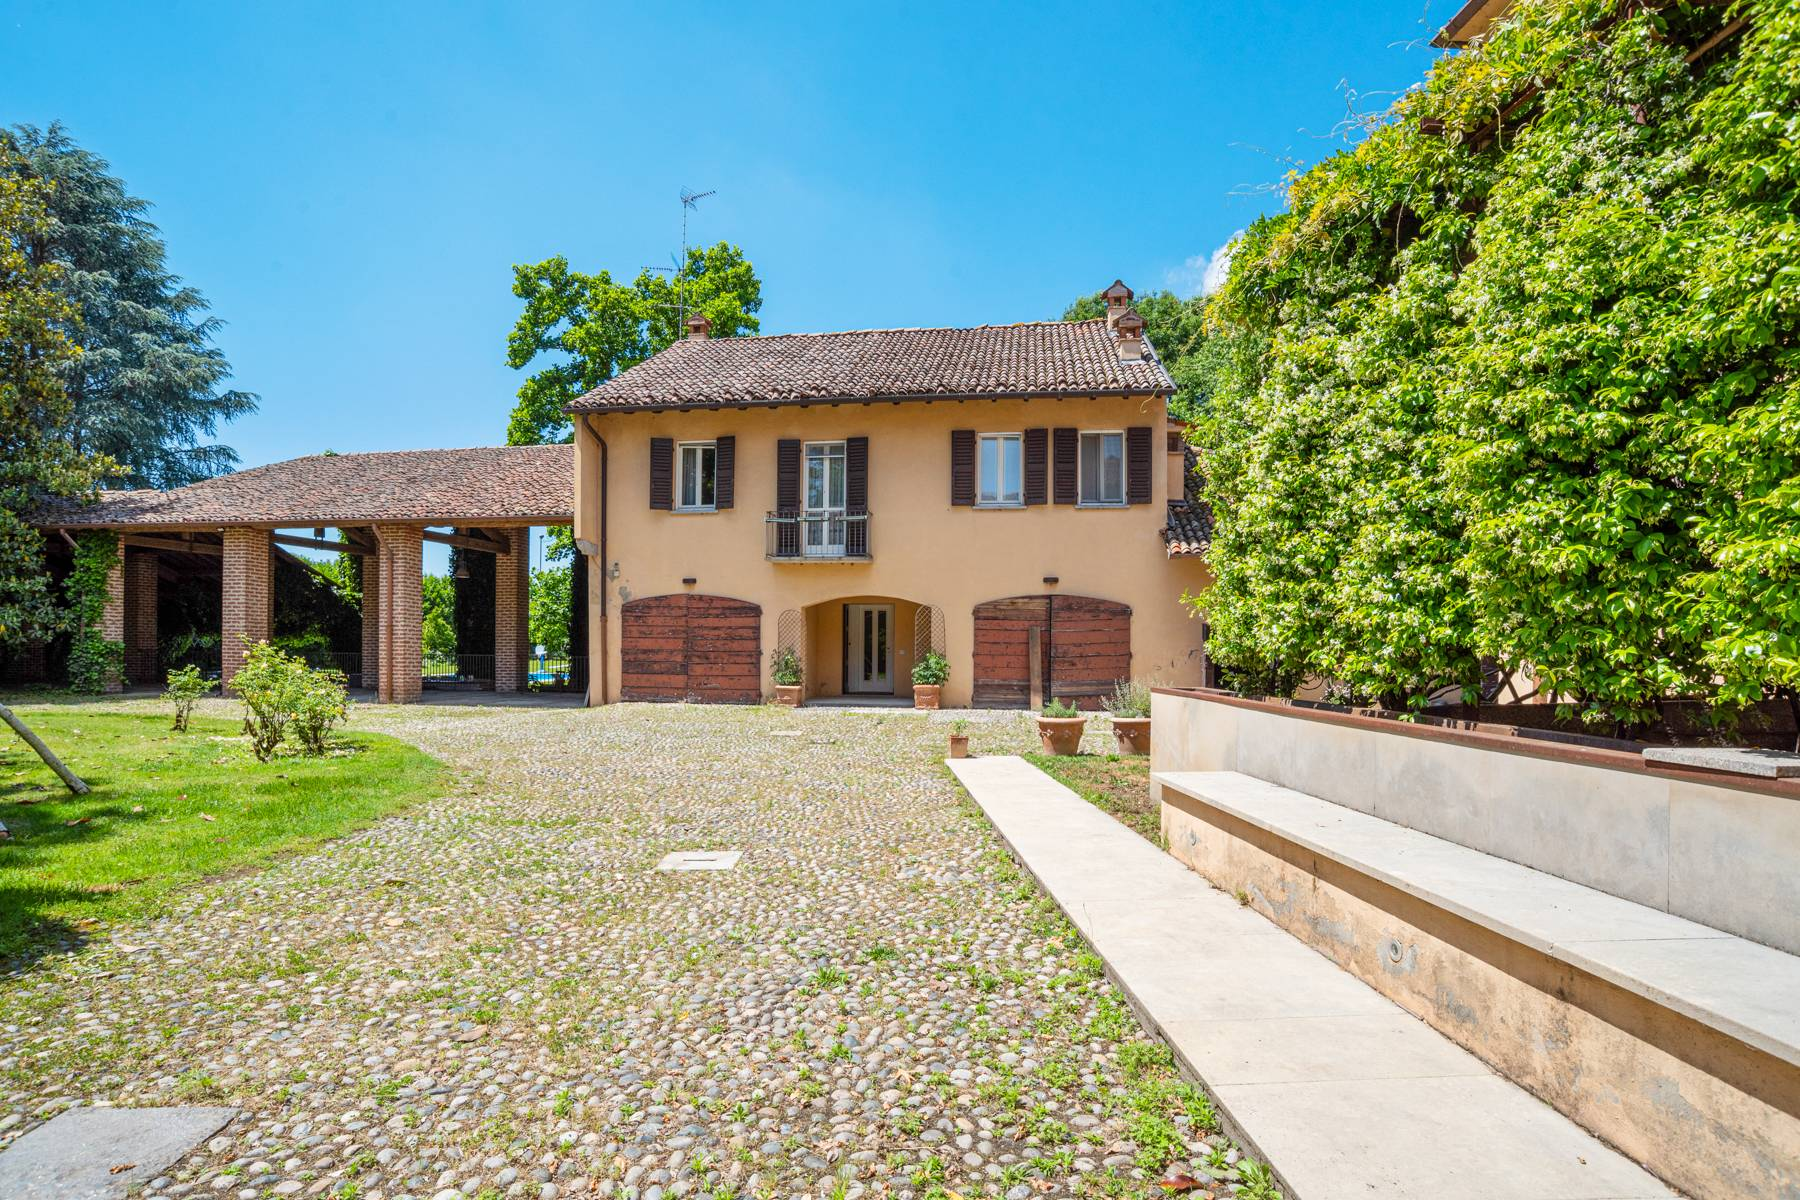 Magnifica proprietà immersa nel verde a Pavia - 22